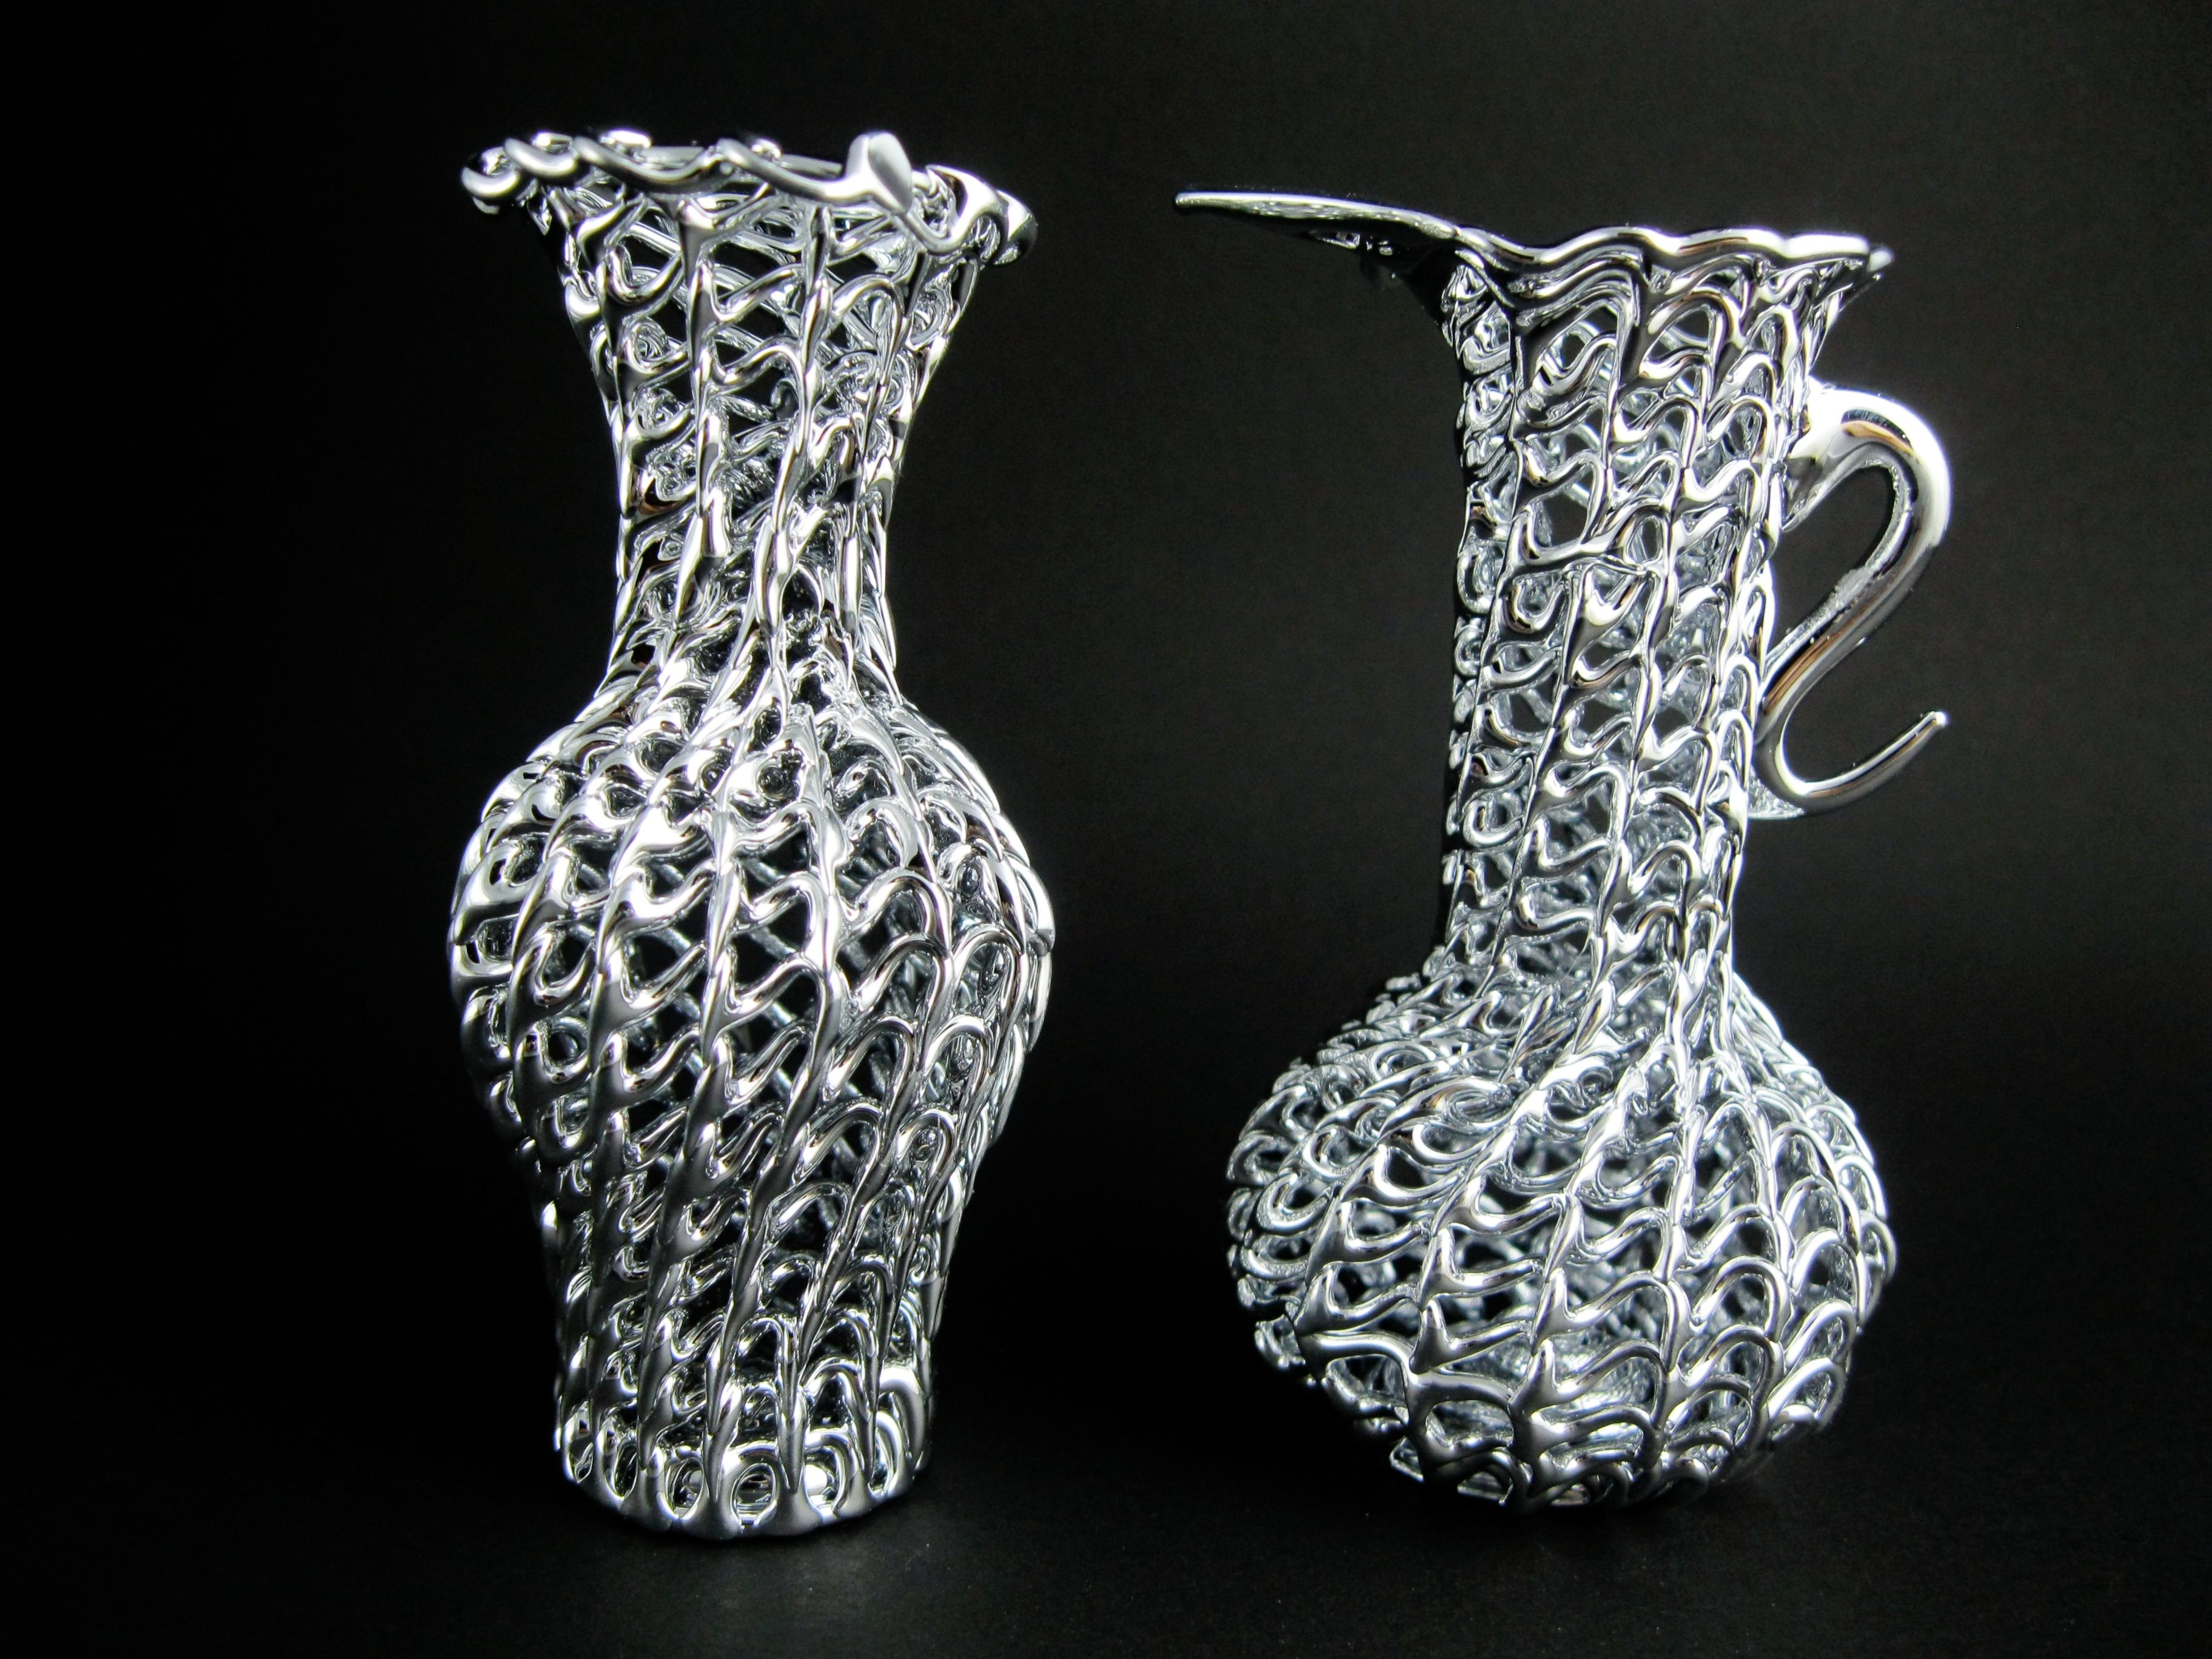 Vasetti anfore vasi vetro argento bomboniere matrimonio for Decorazione x cresima